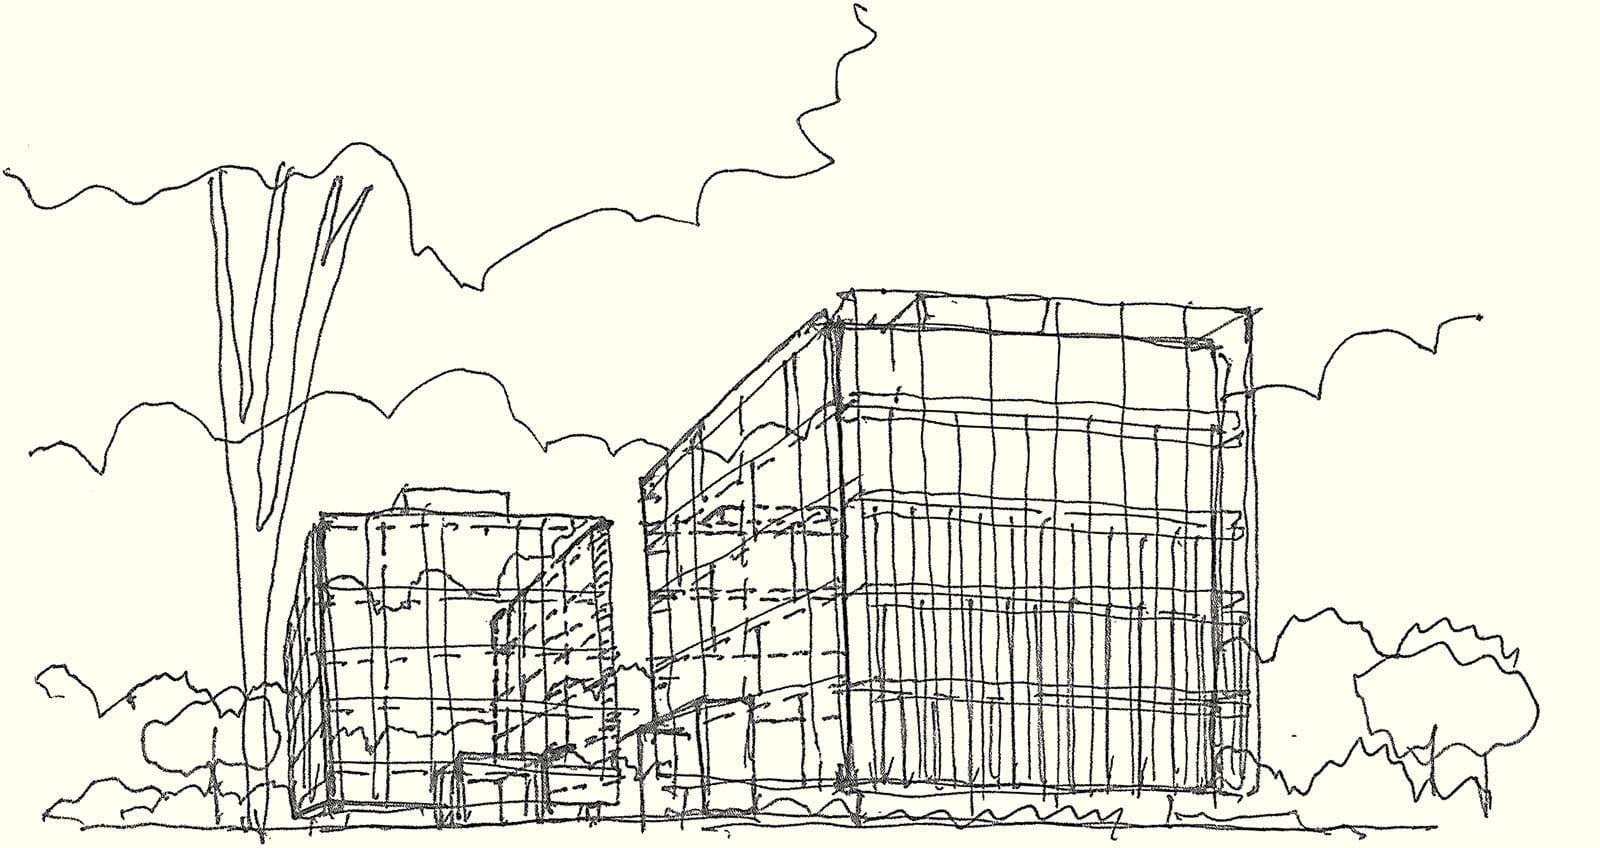 Petit-Jervois-building design